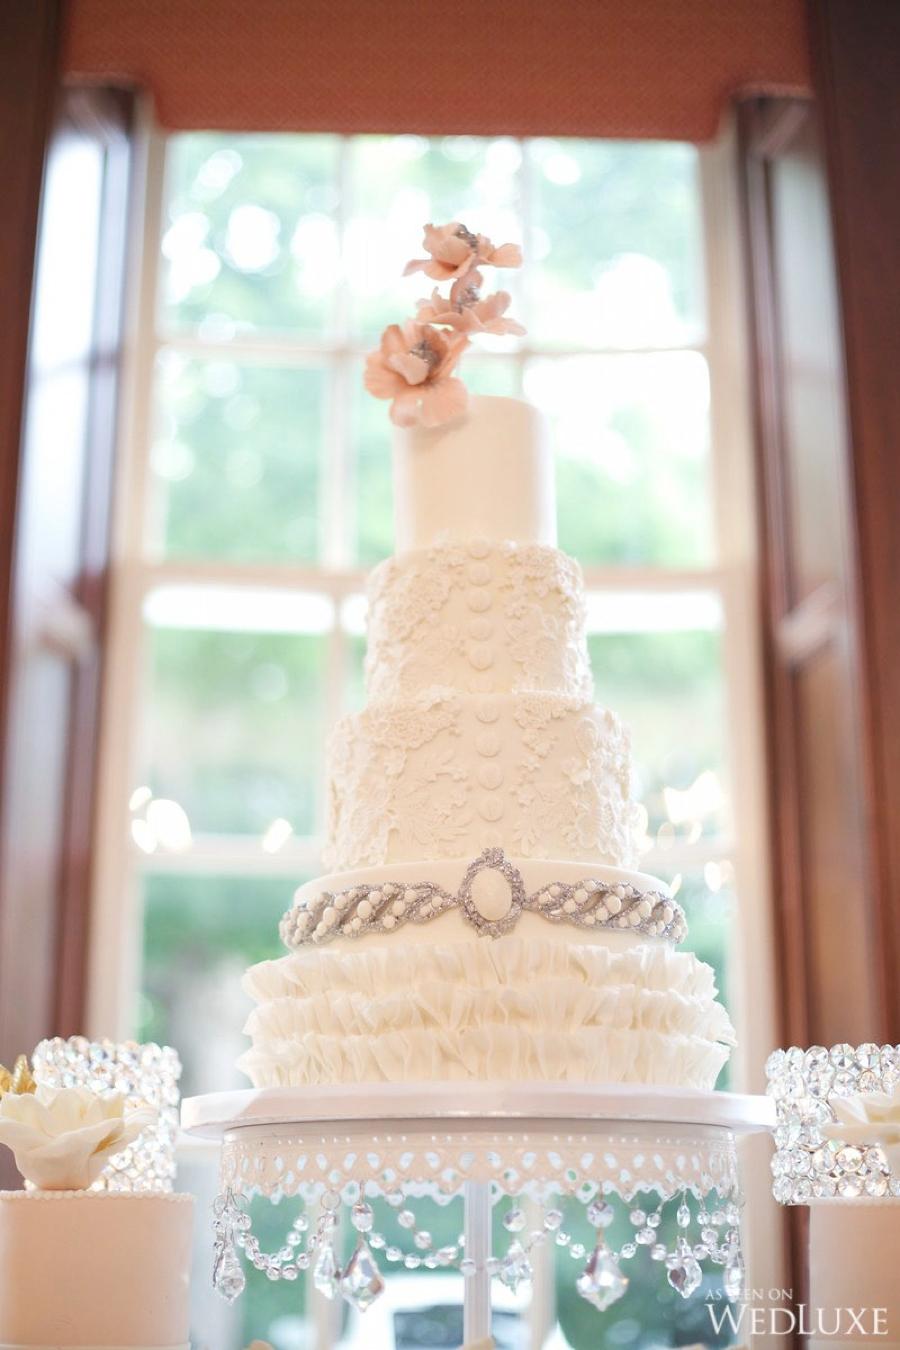 Cake: Truffle Cake & Pastry Photo: Hoyin Siu Photography Studio